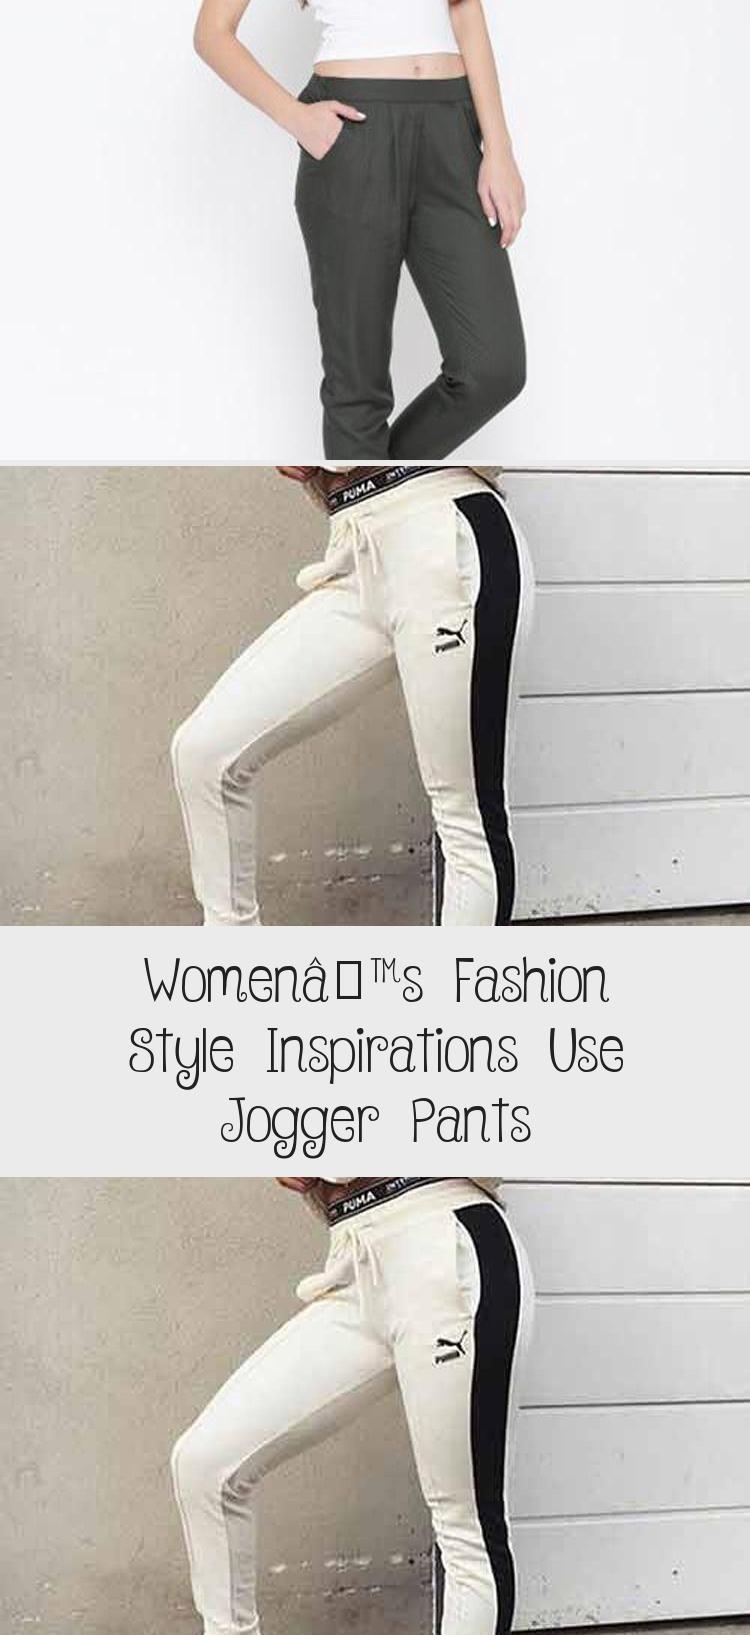 Women S Fashion Style Inspirations Use Jogger Pants Women Fashion Outfit Pants Style Styles Woman In 2020 Jogger Pants Jogger Pants Style Black Jogger Pants